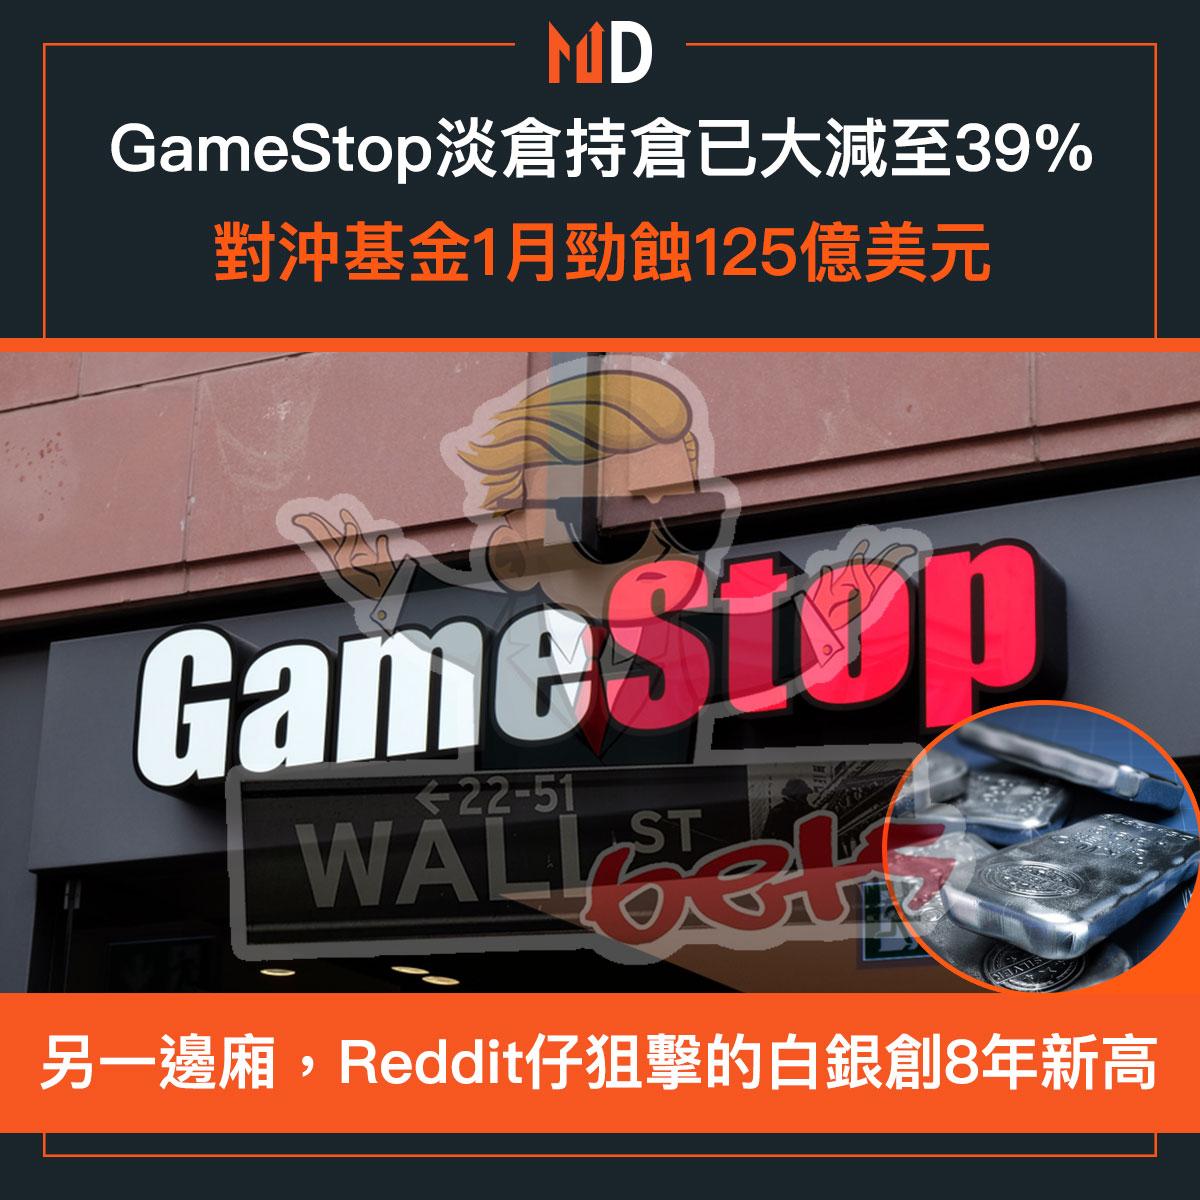 GameStop淡倉持倉已大減至39%,對沖基金1月勁蝕125億美元